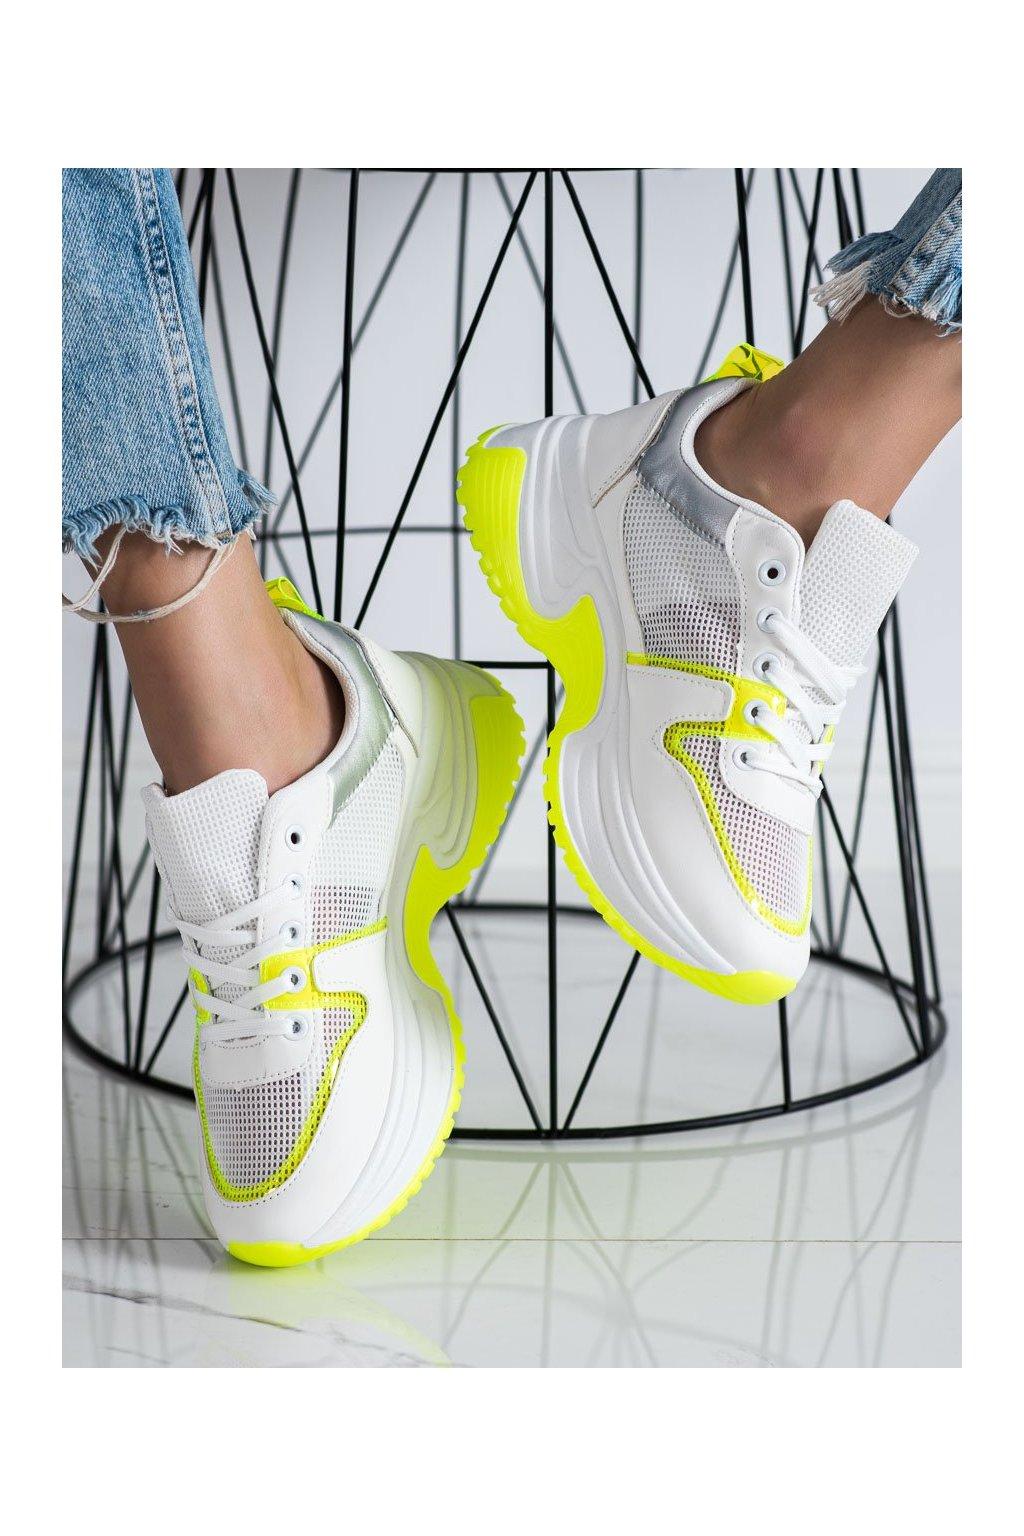 Biele tenisky Shelovet kod BOK03W/GR